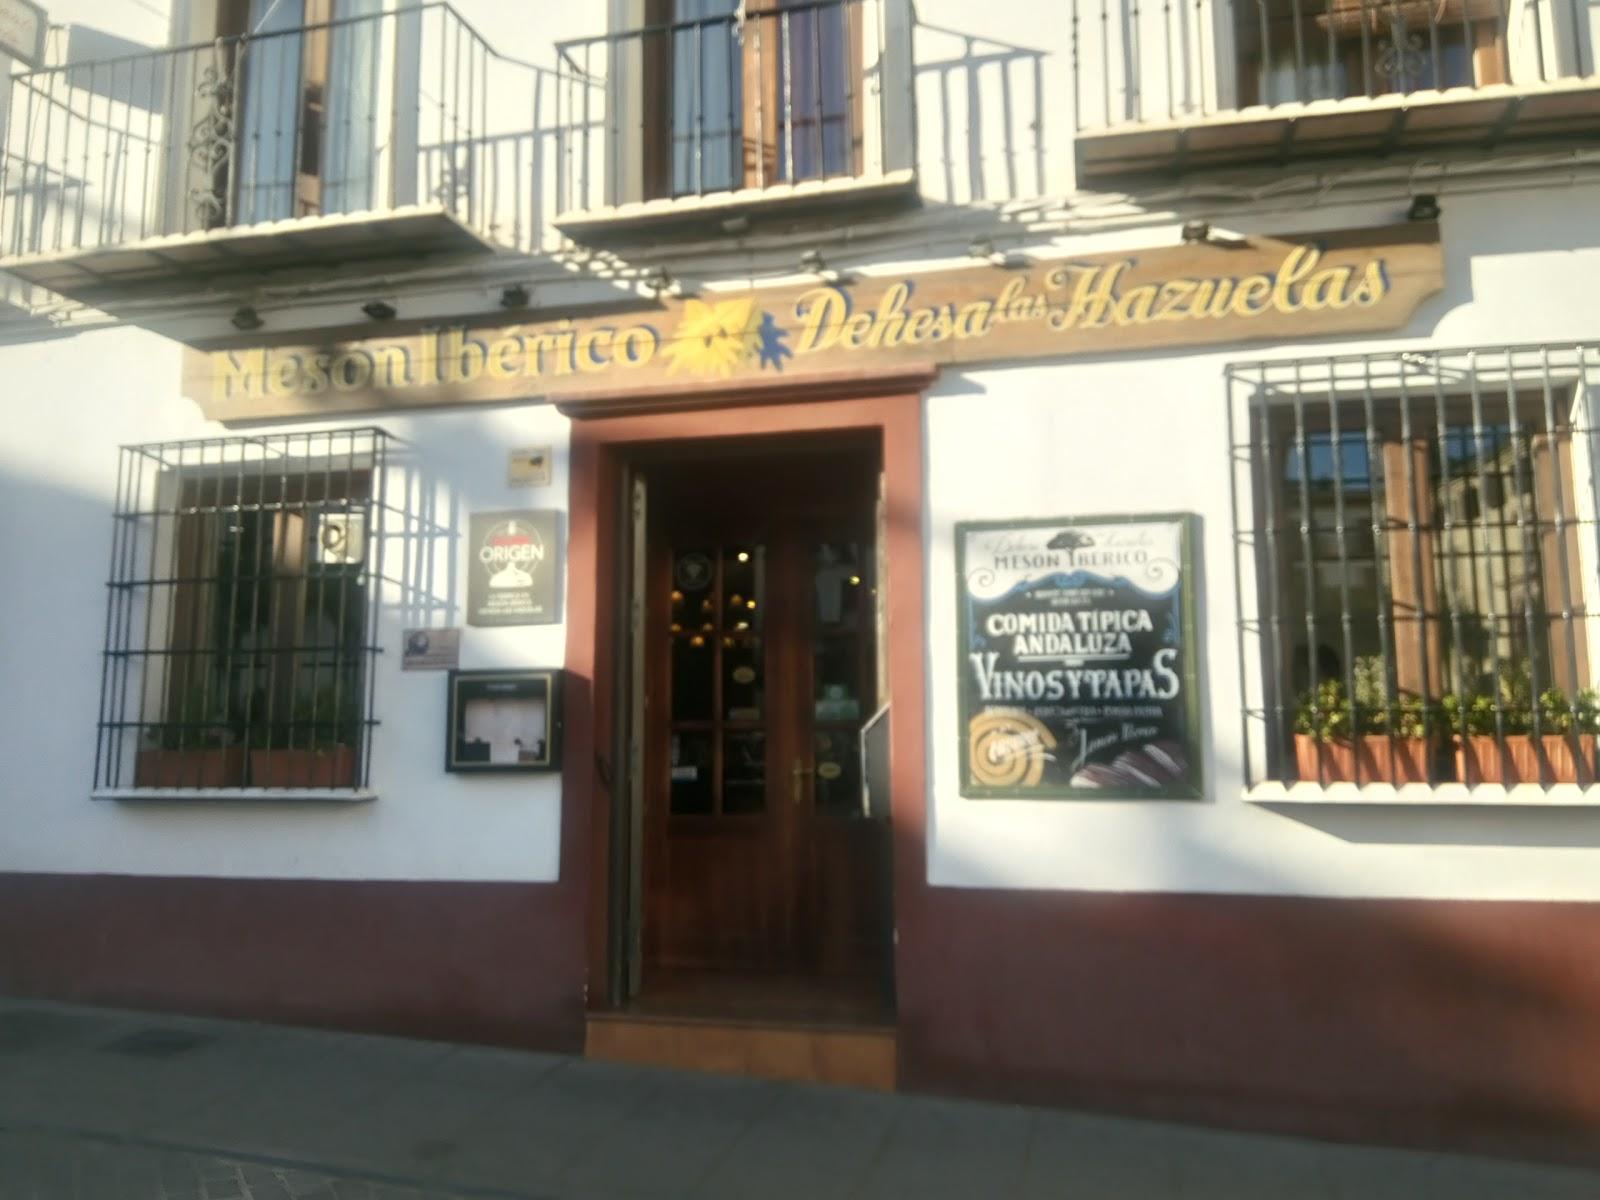 Restaurante la Dehesa